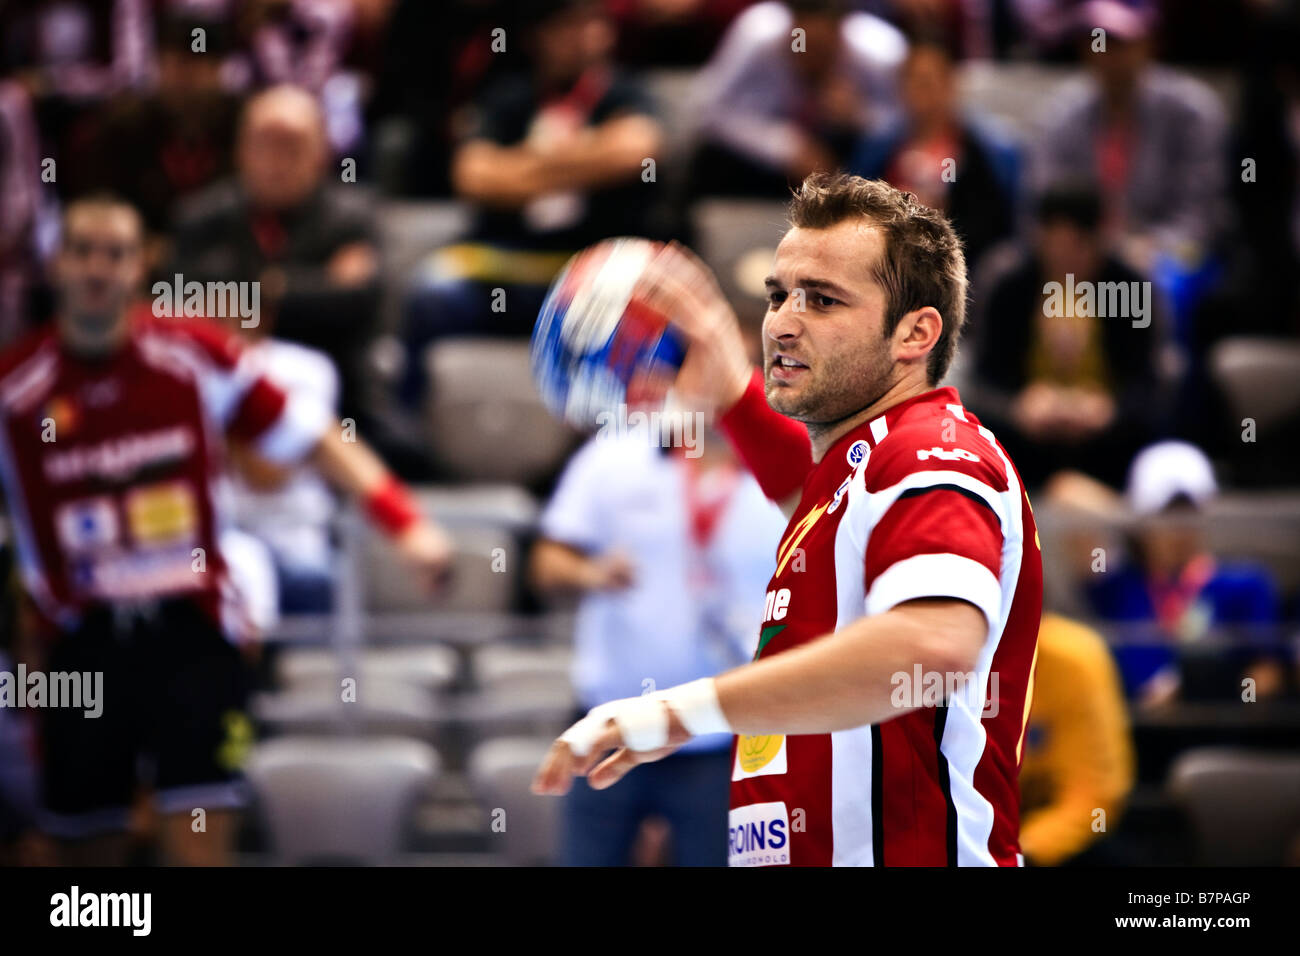 World Handball Championship for Men 2009 in Croatia. Match Romania-Argentina. Endscore 30:26. Marius Stavrositu. - Stock Image